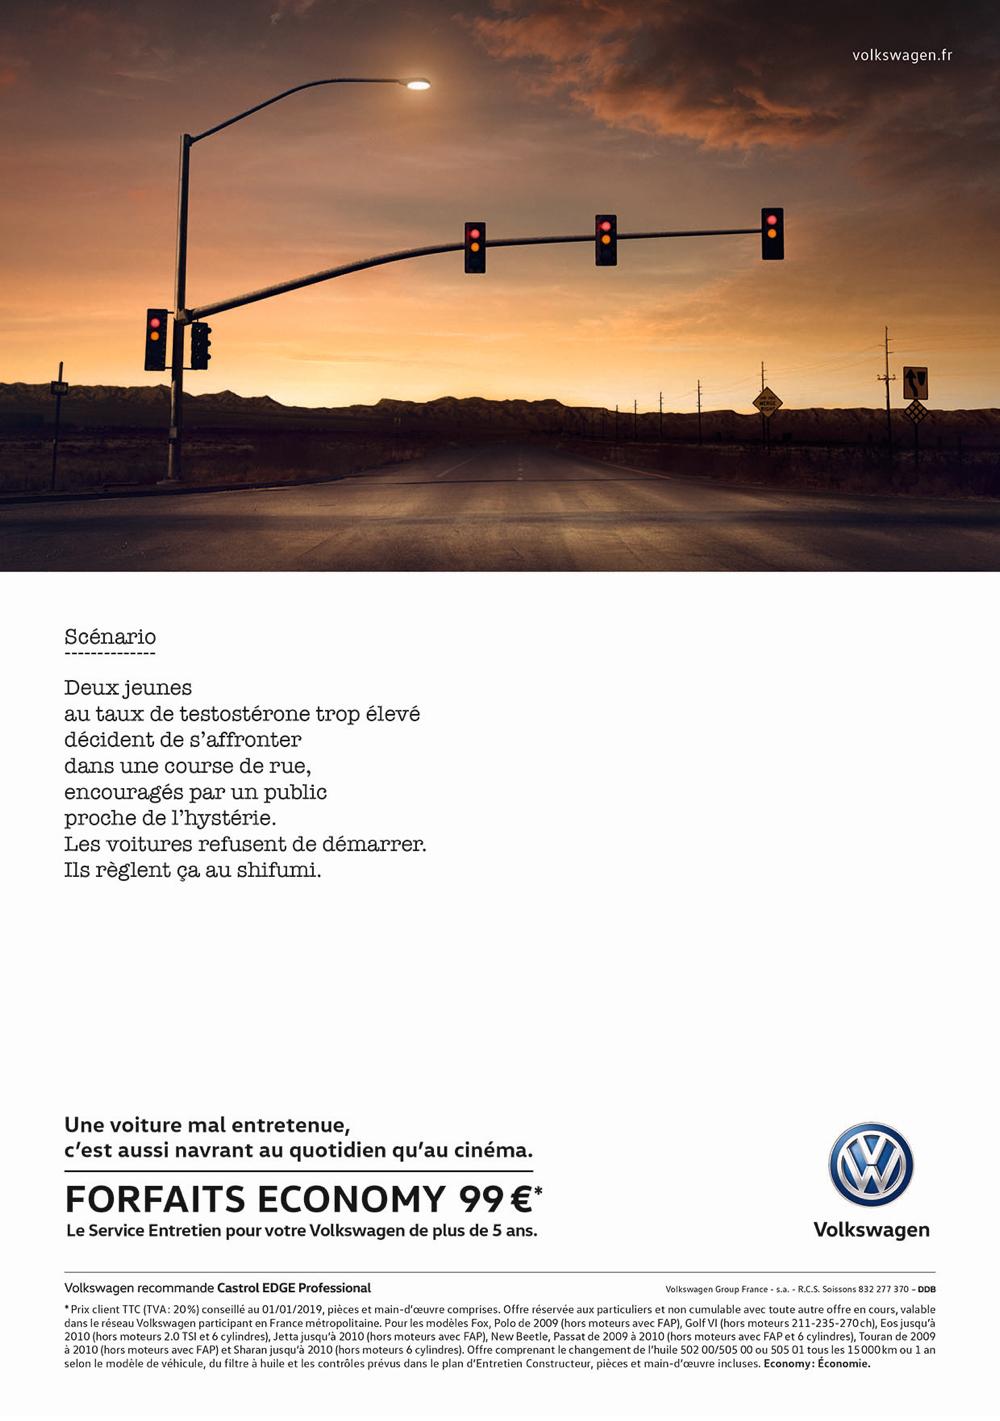 VW ENTRETIEN AUTO img2